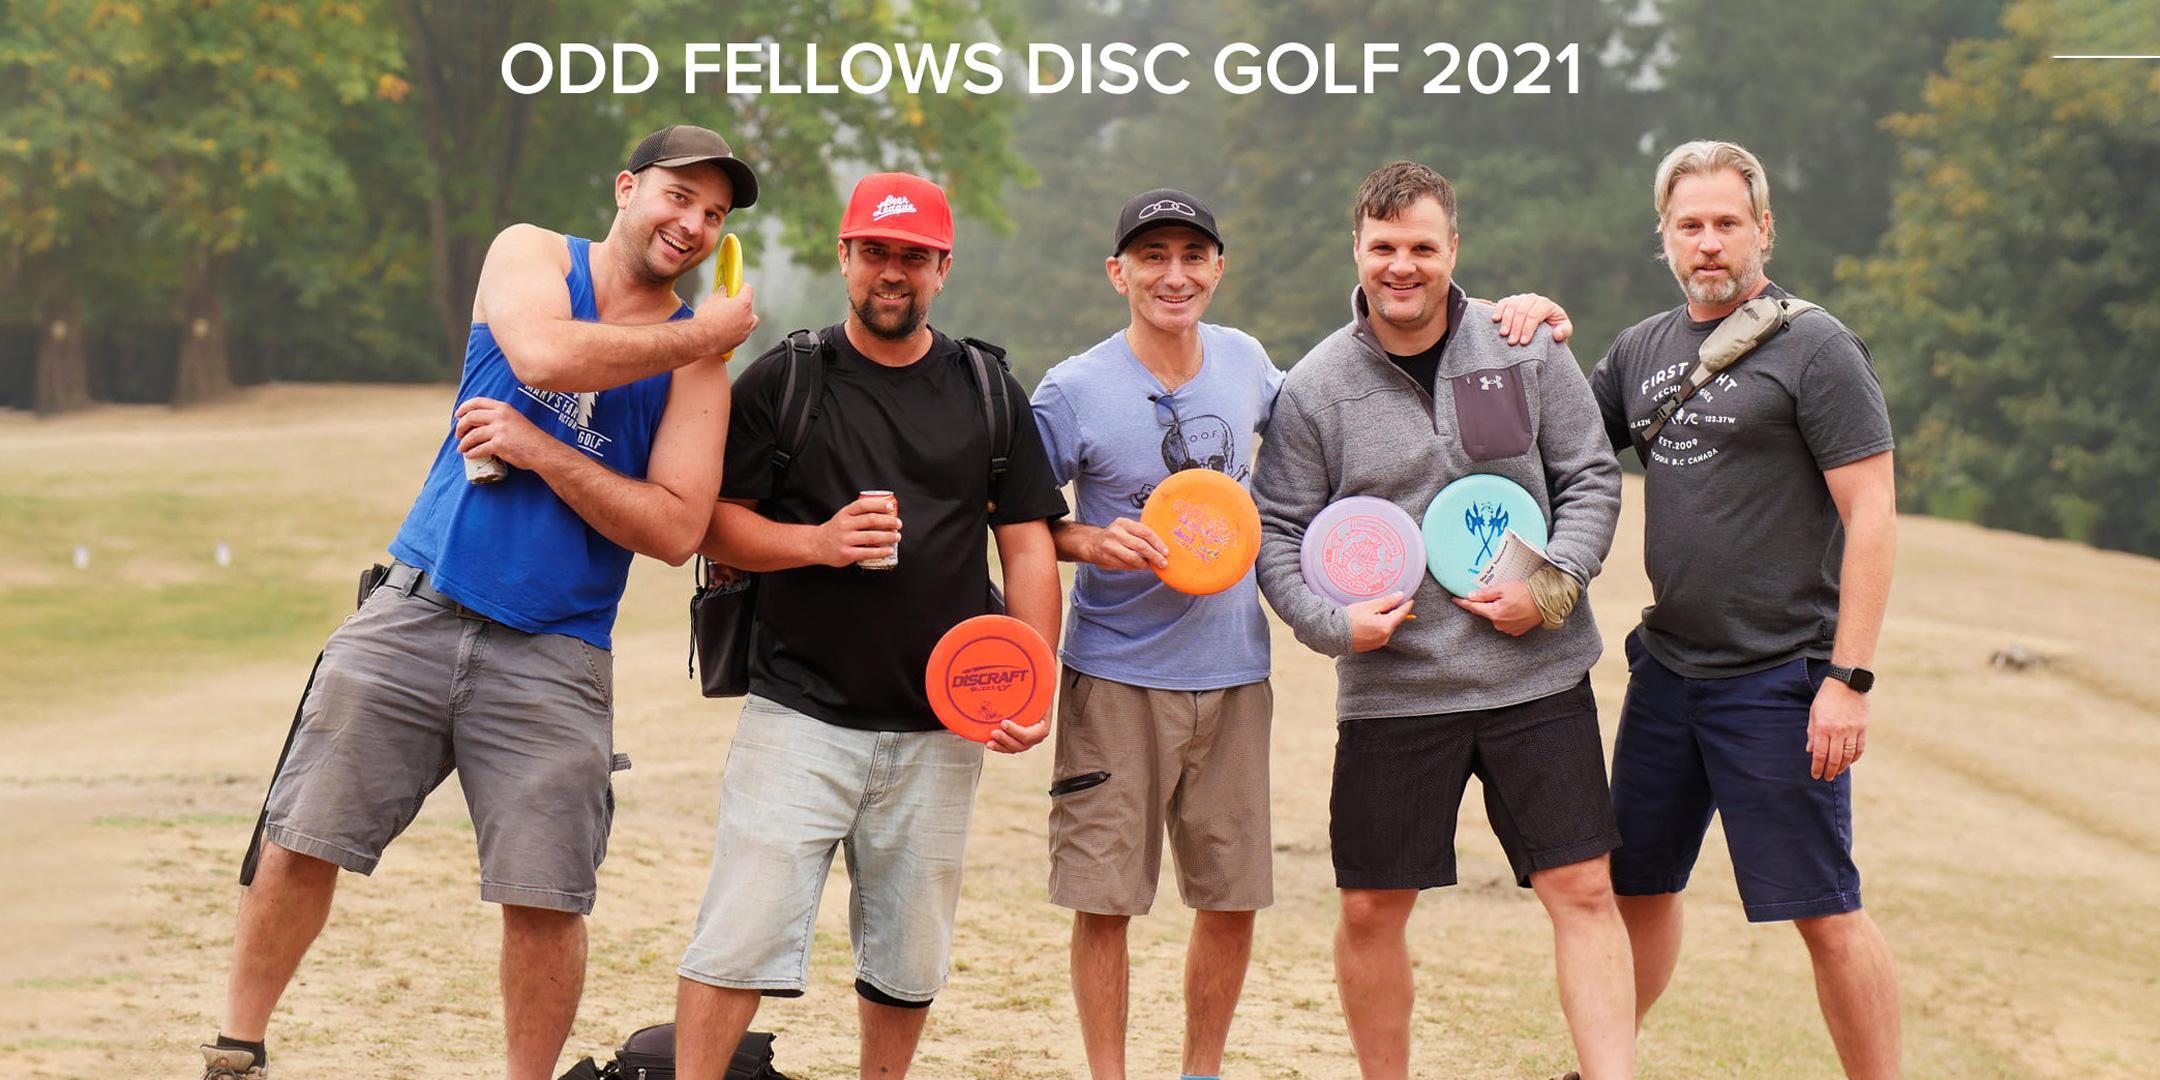 5th Annual Charity Odd Fellows Disc Golf Jamboree September 11, 2021